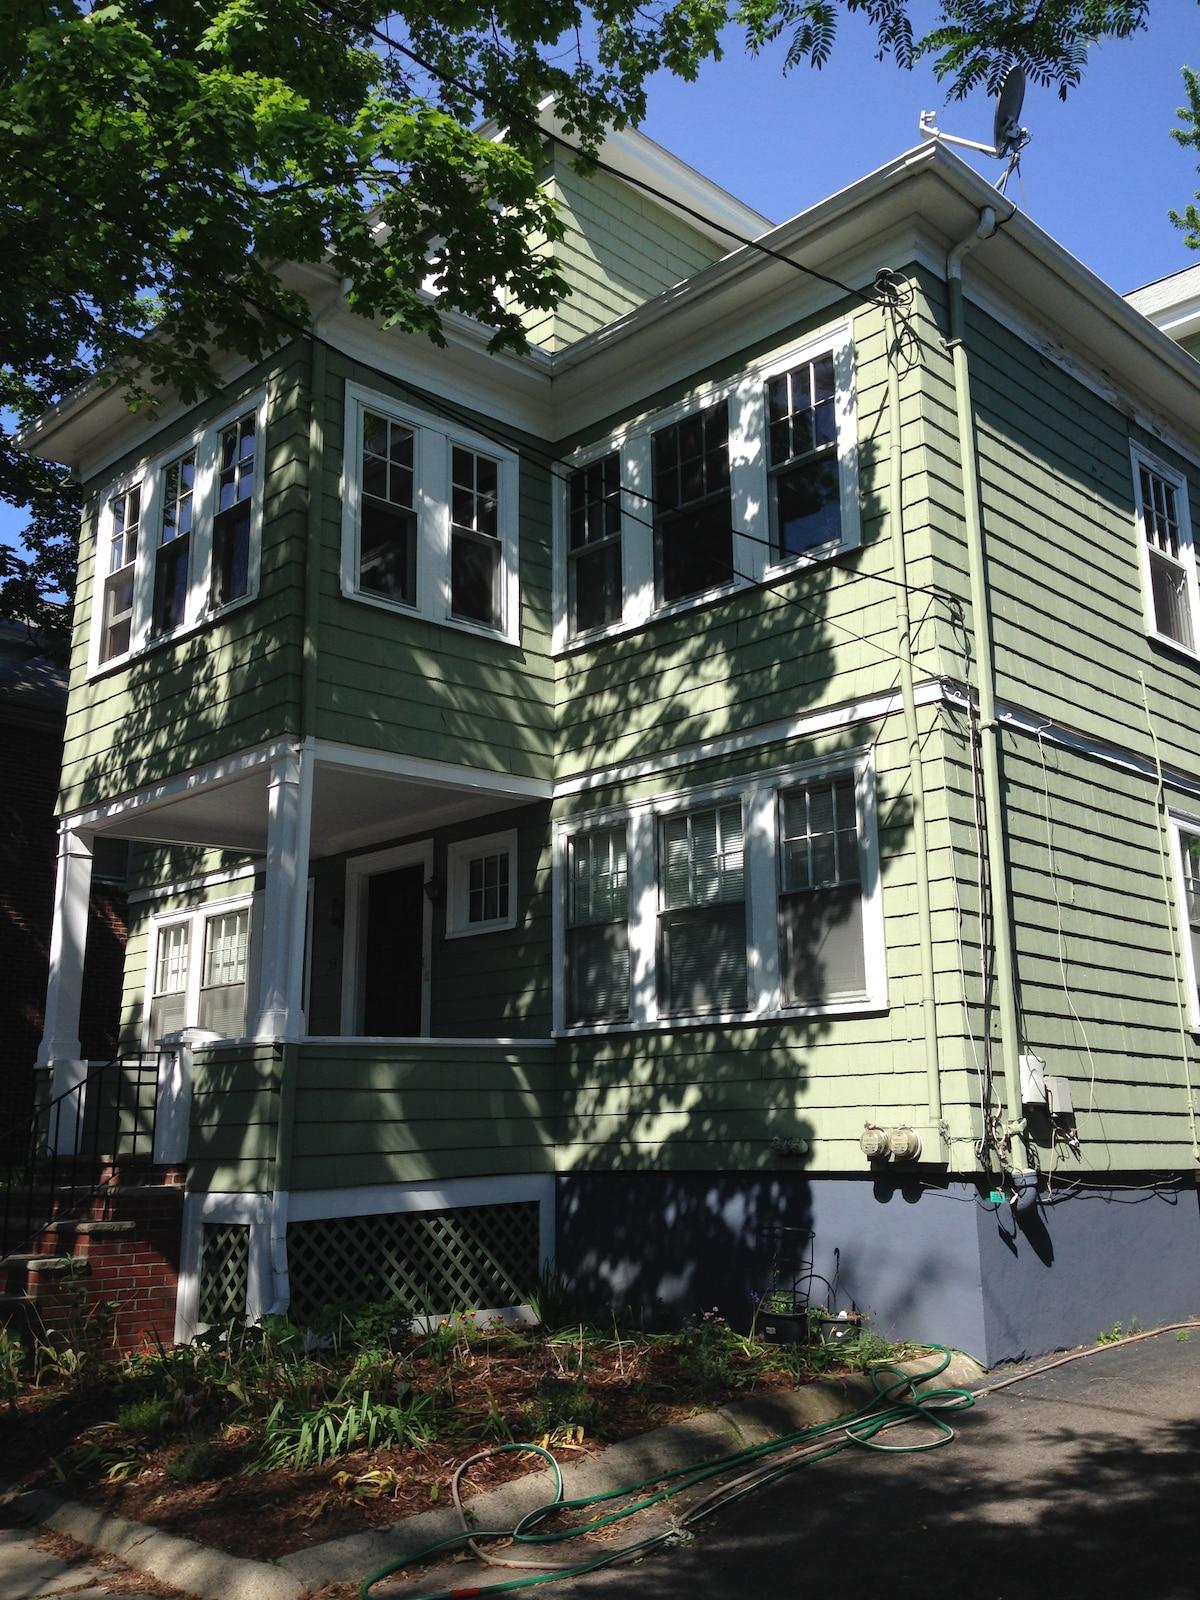 Steps away from Harvard, Inman & Sq